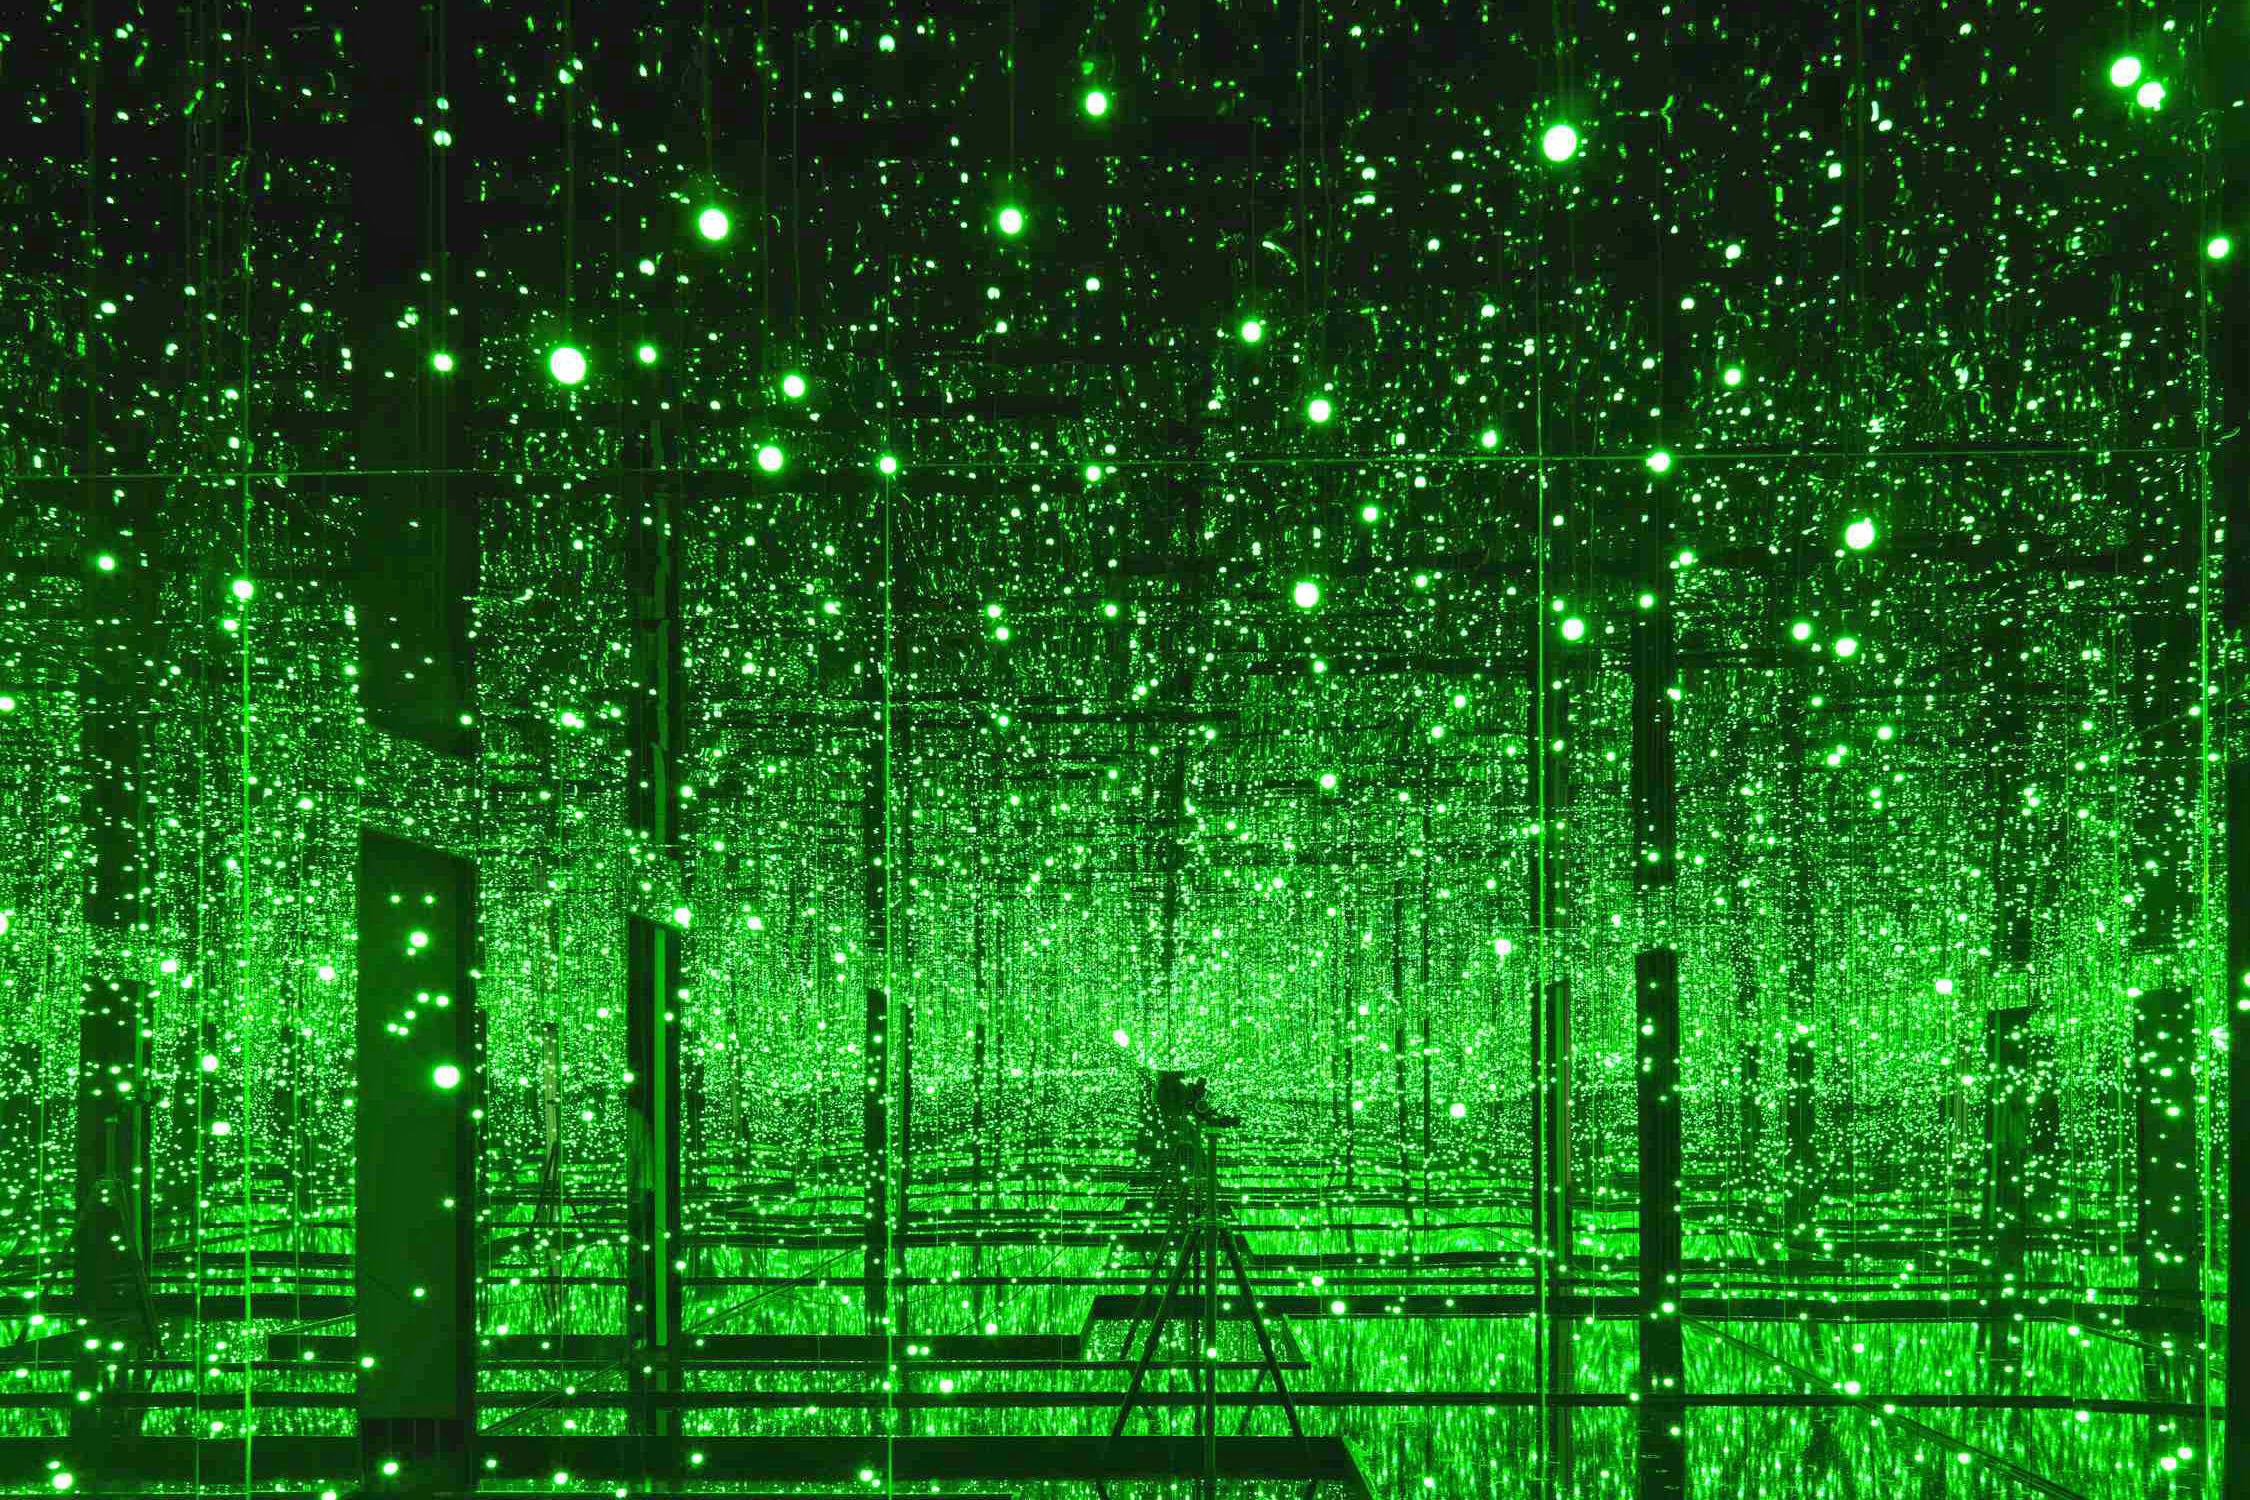 yayoi-kusama-filled-with-the-brilliance-of-life-2011-cortesia-de-la-galeria-victoria-miro-londres-verde